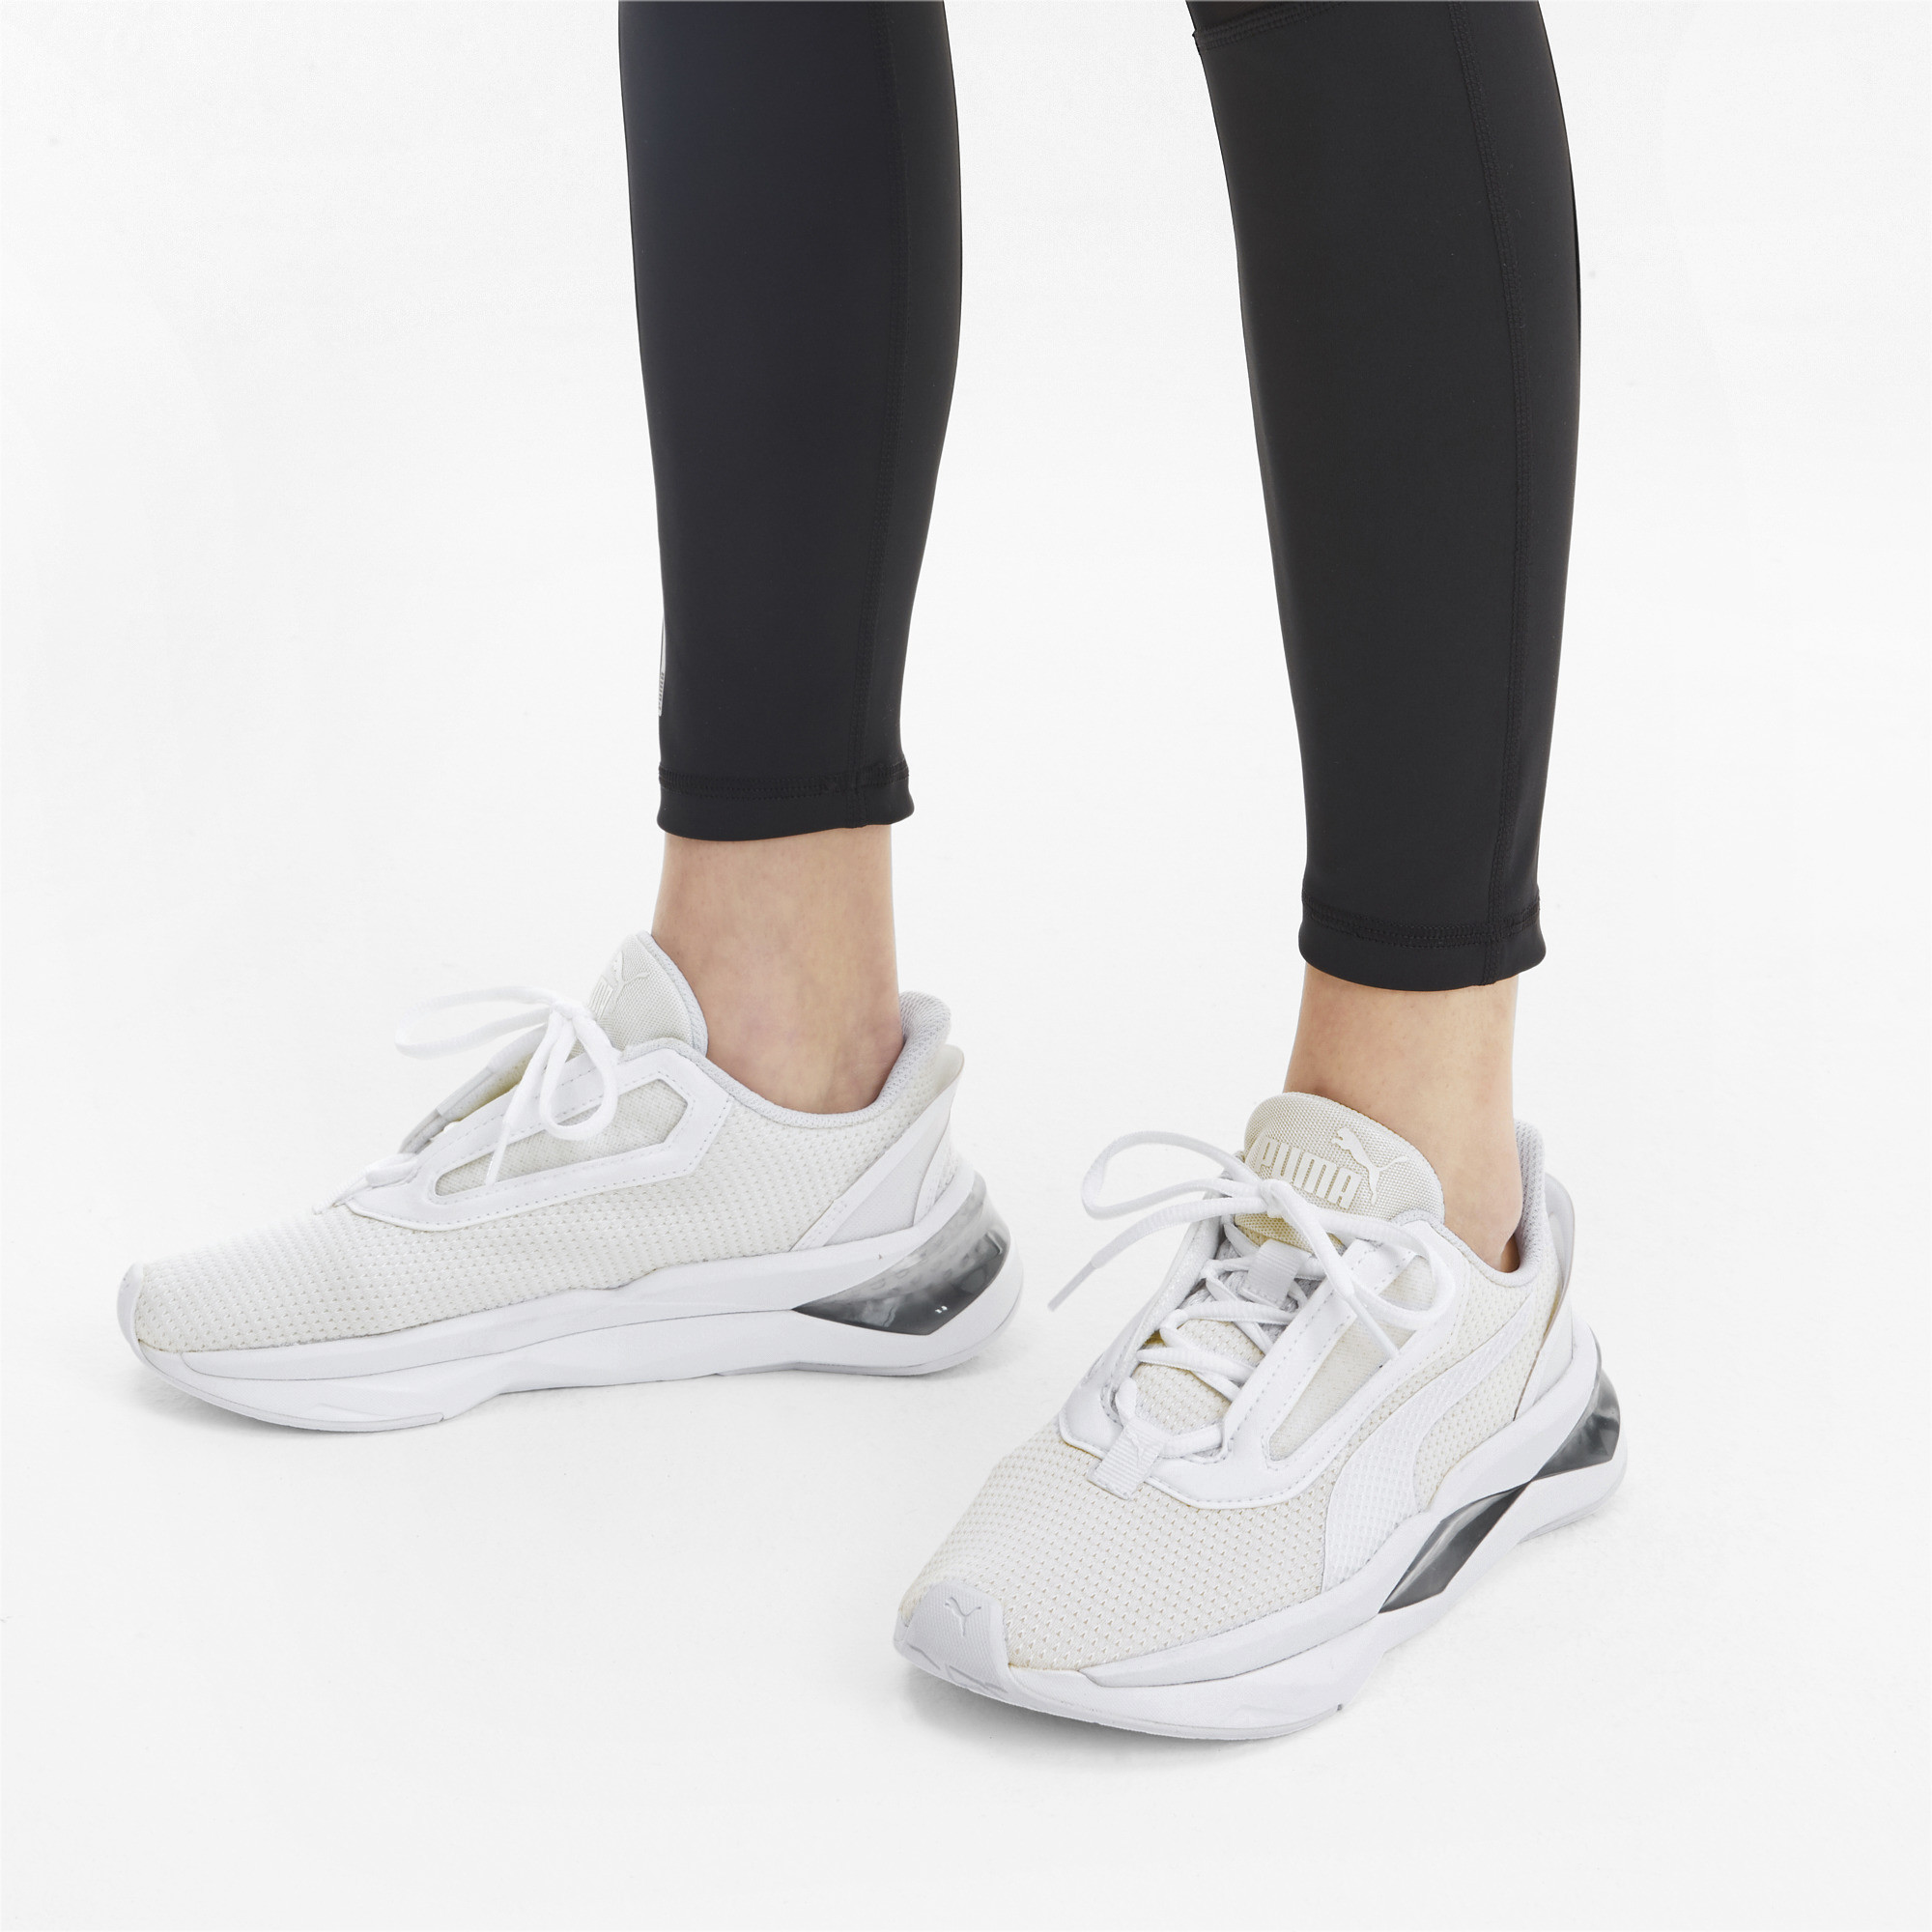 Details about PUMA Women's LQDCELL Shatter XT NC Training Shoes